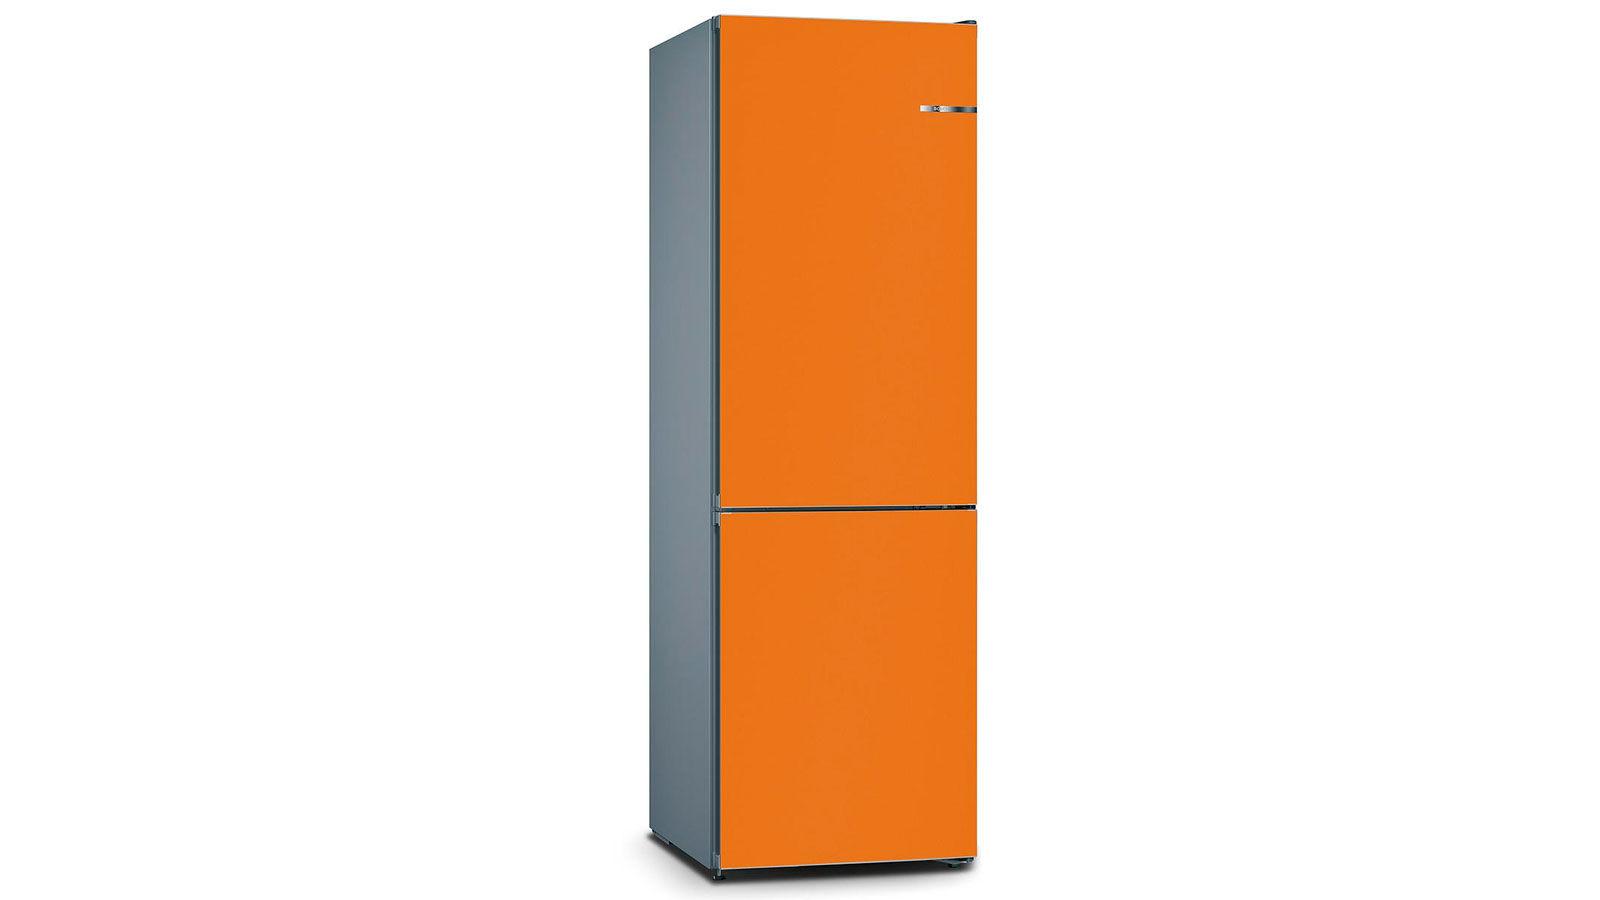 BOSCH 324L雙門雪櫃/配可更換門板 KVN36IO3BK-鮮橙色